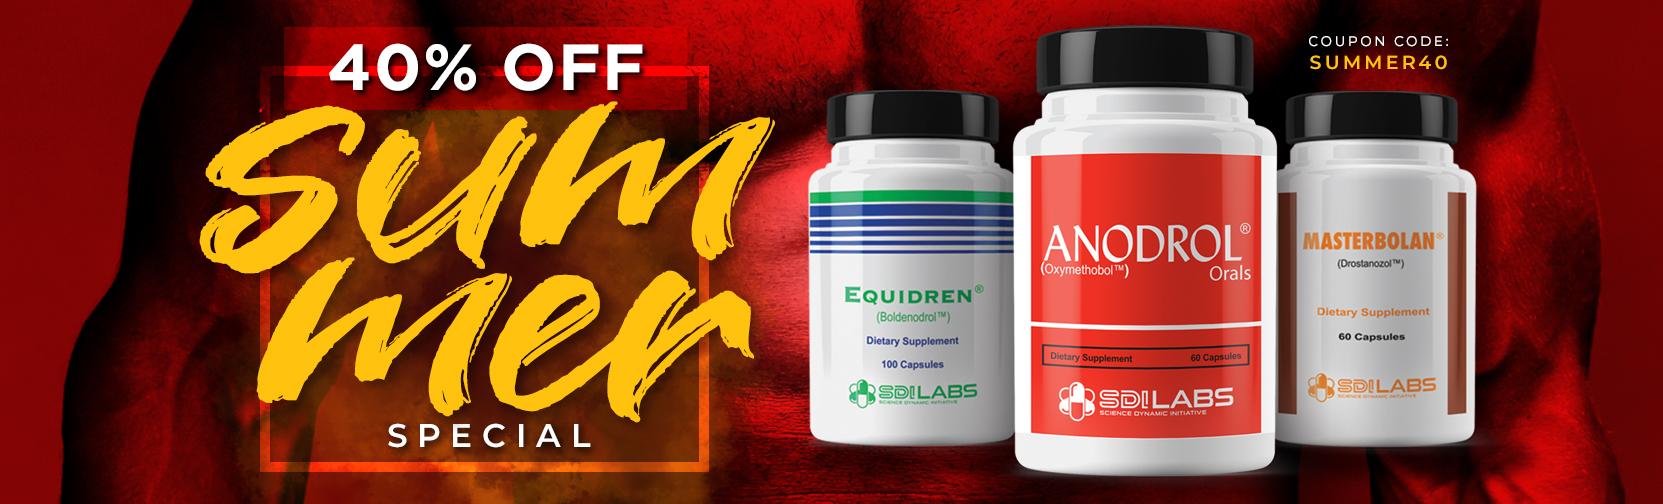 Legal Steroids Alternative Summer Sale 40% Off